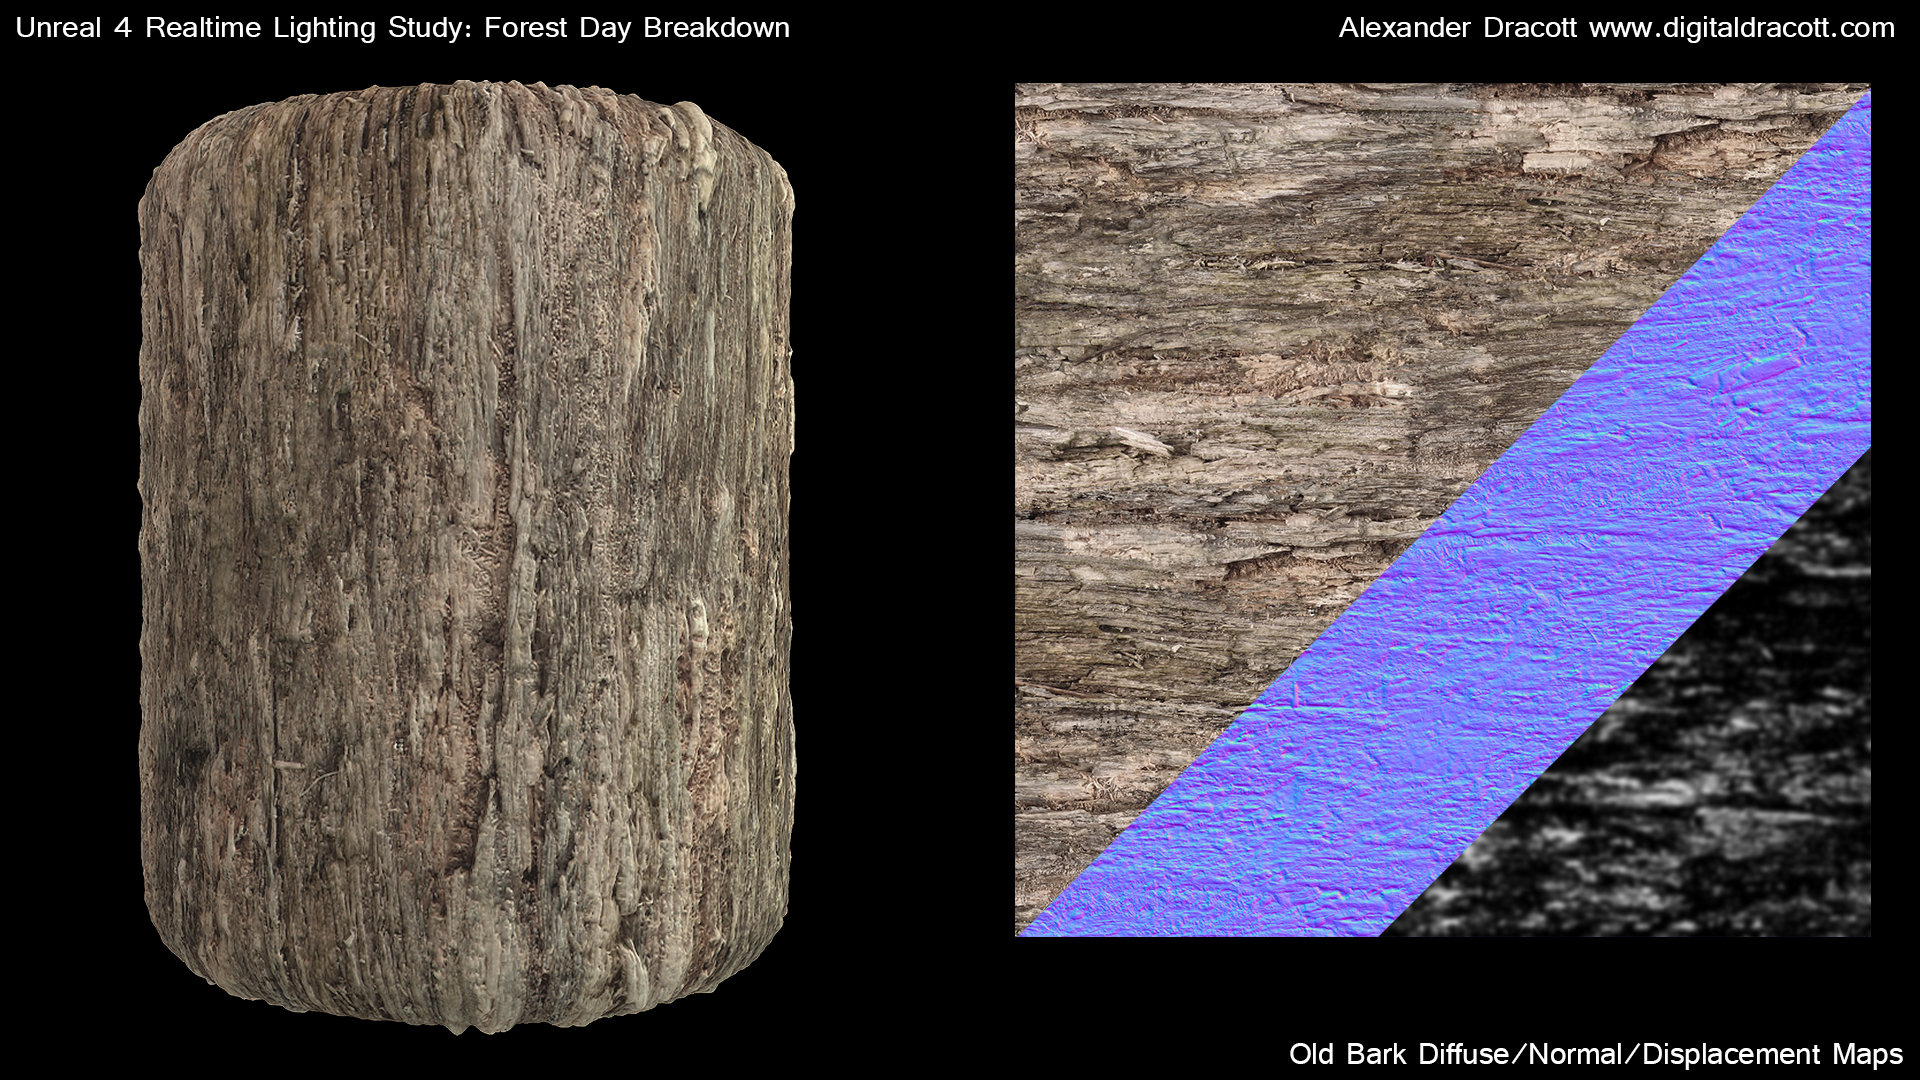 Alexander dracott forestbreakdown textureoldbark